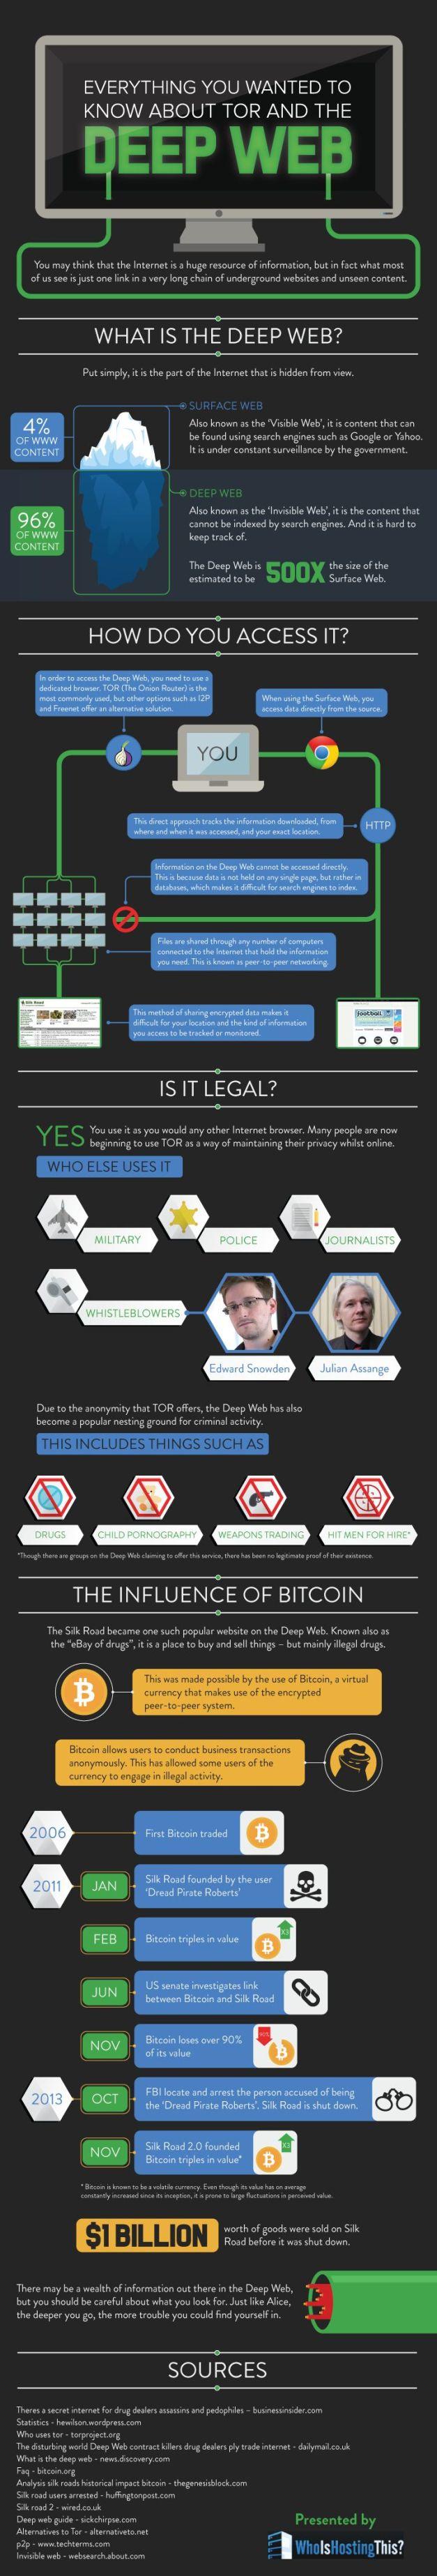 jorge-lizama-cybermedios-deep-web-infography-whoishostingthis